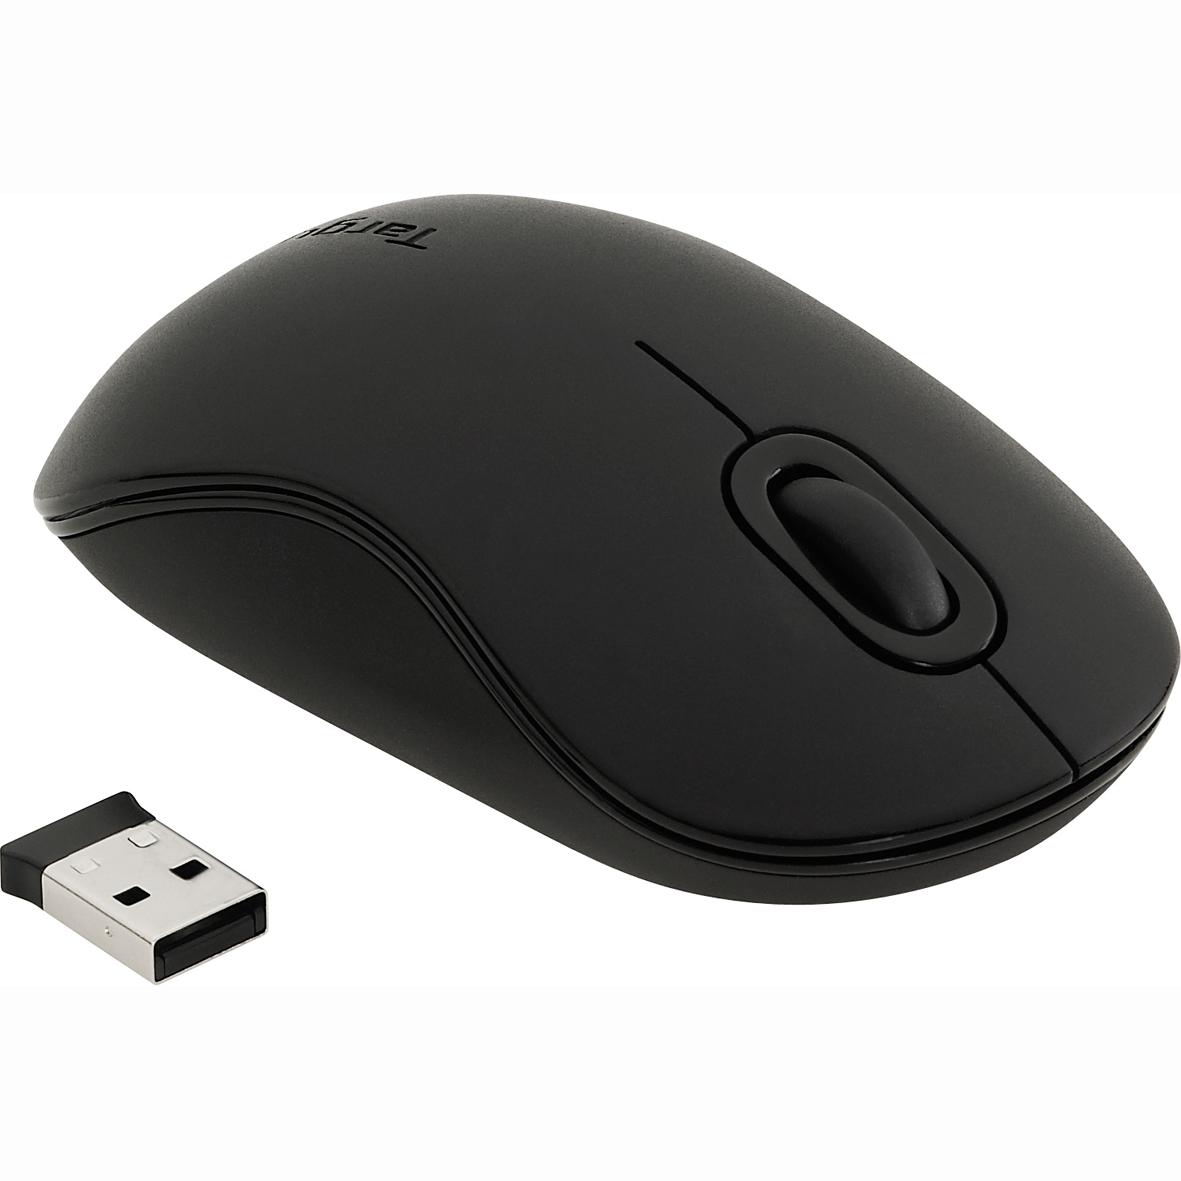 Targus Wireless Optical Mouse Micro Power Usb 24ghz Plug And Play